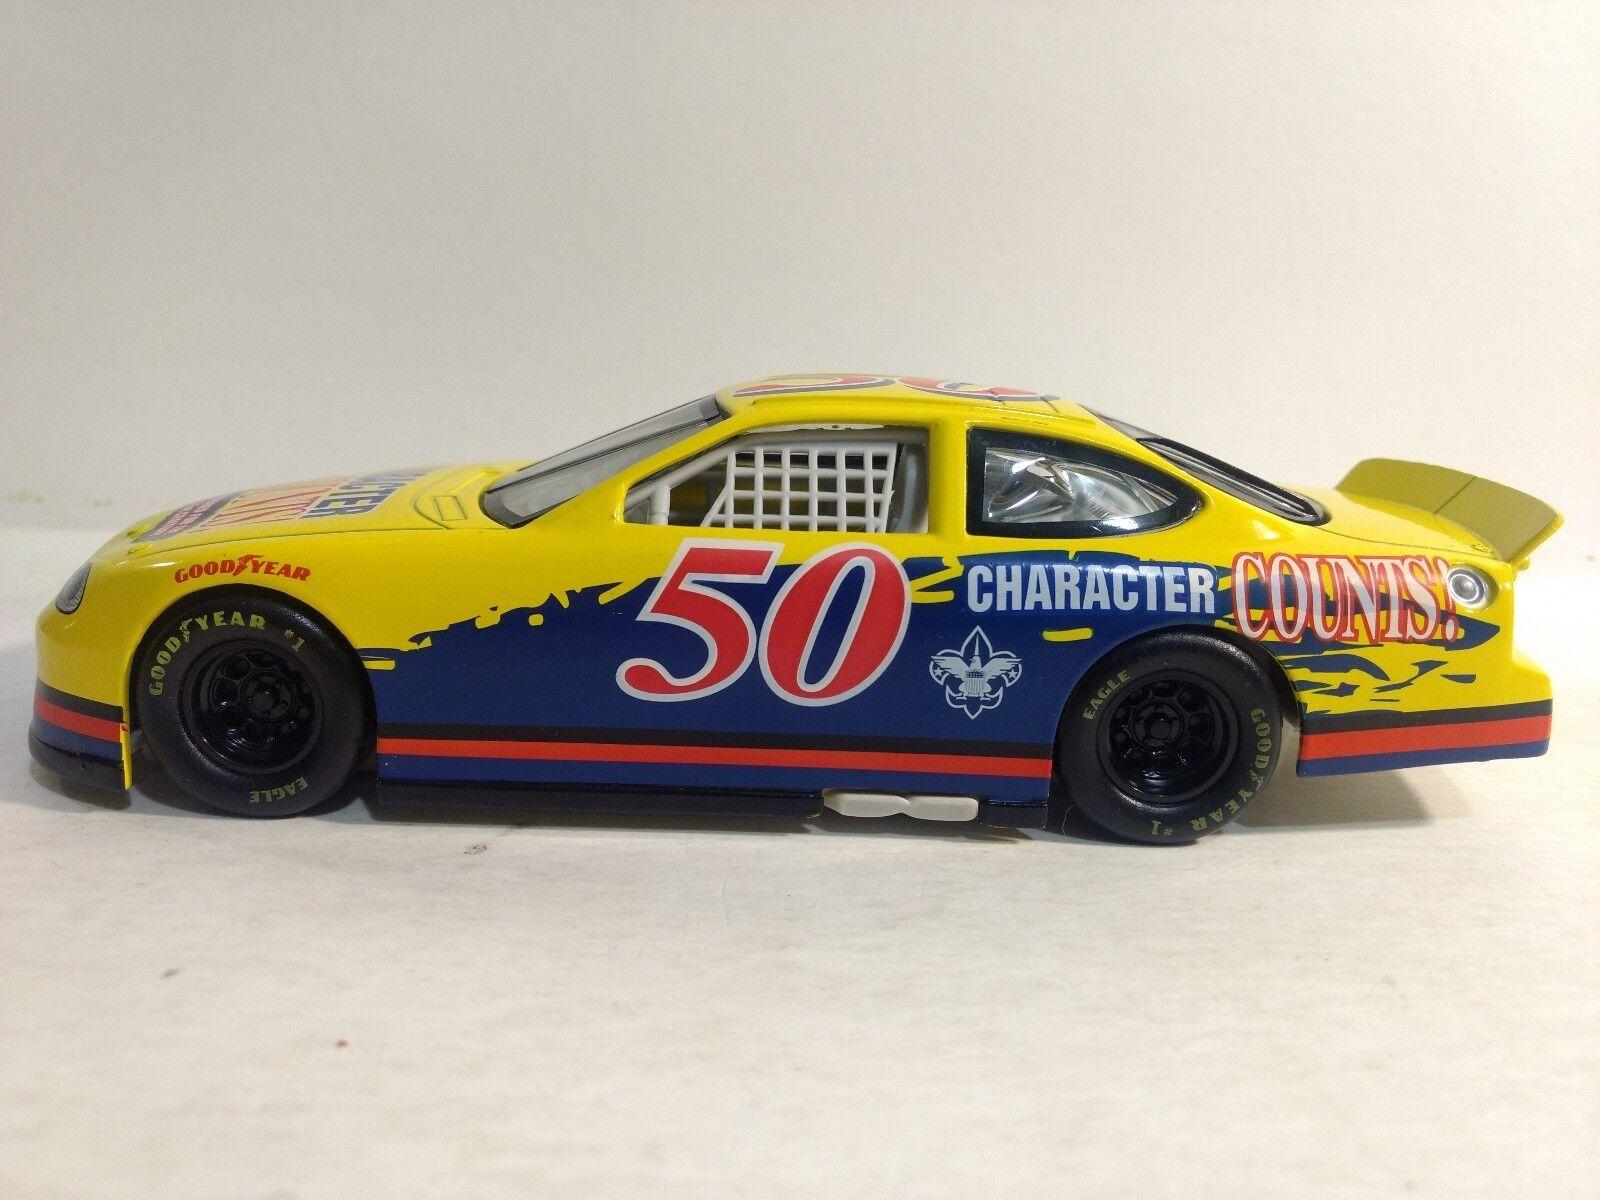 Raro Nascar Carta Conta Ford Taurus 1 24 Scala Diecast Mattel 1997 Dc2060